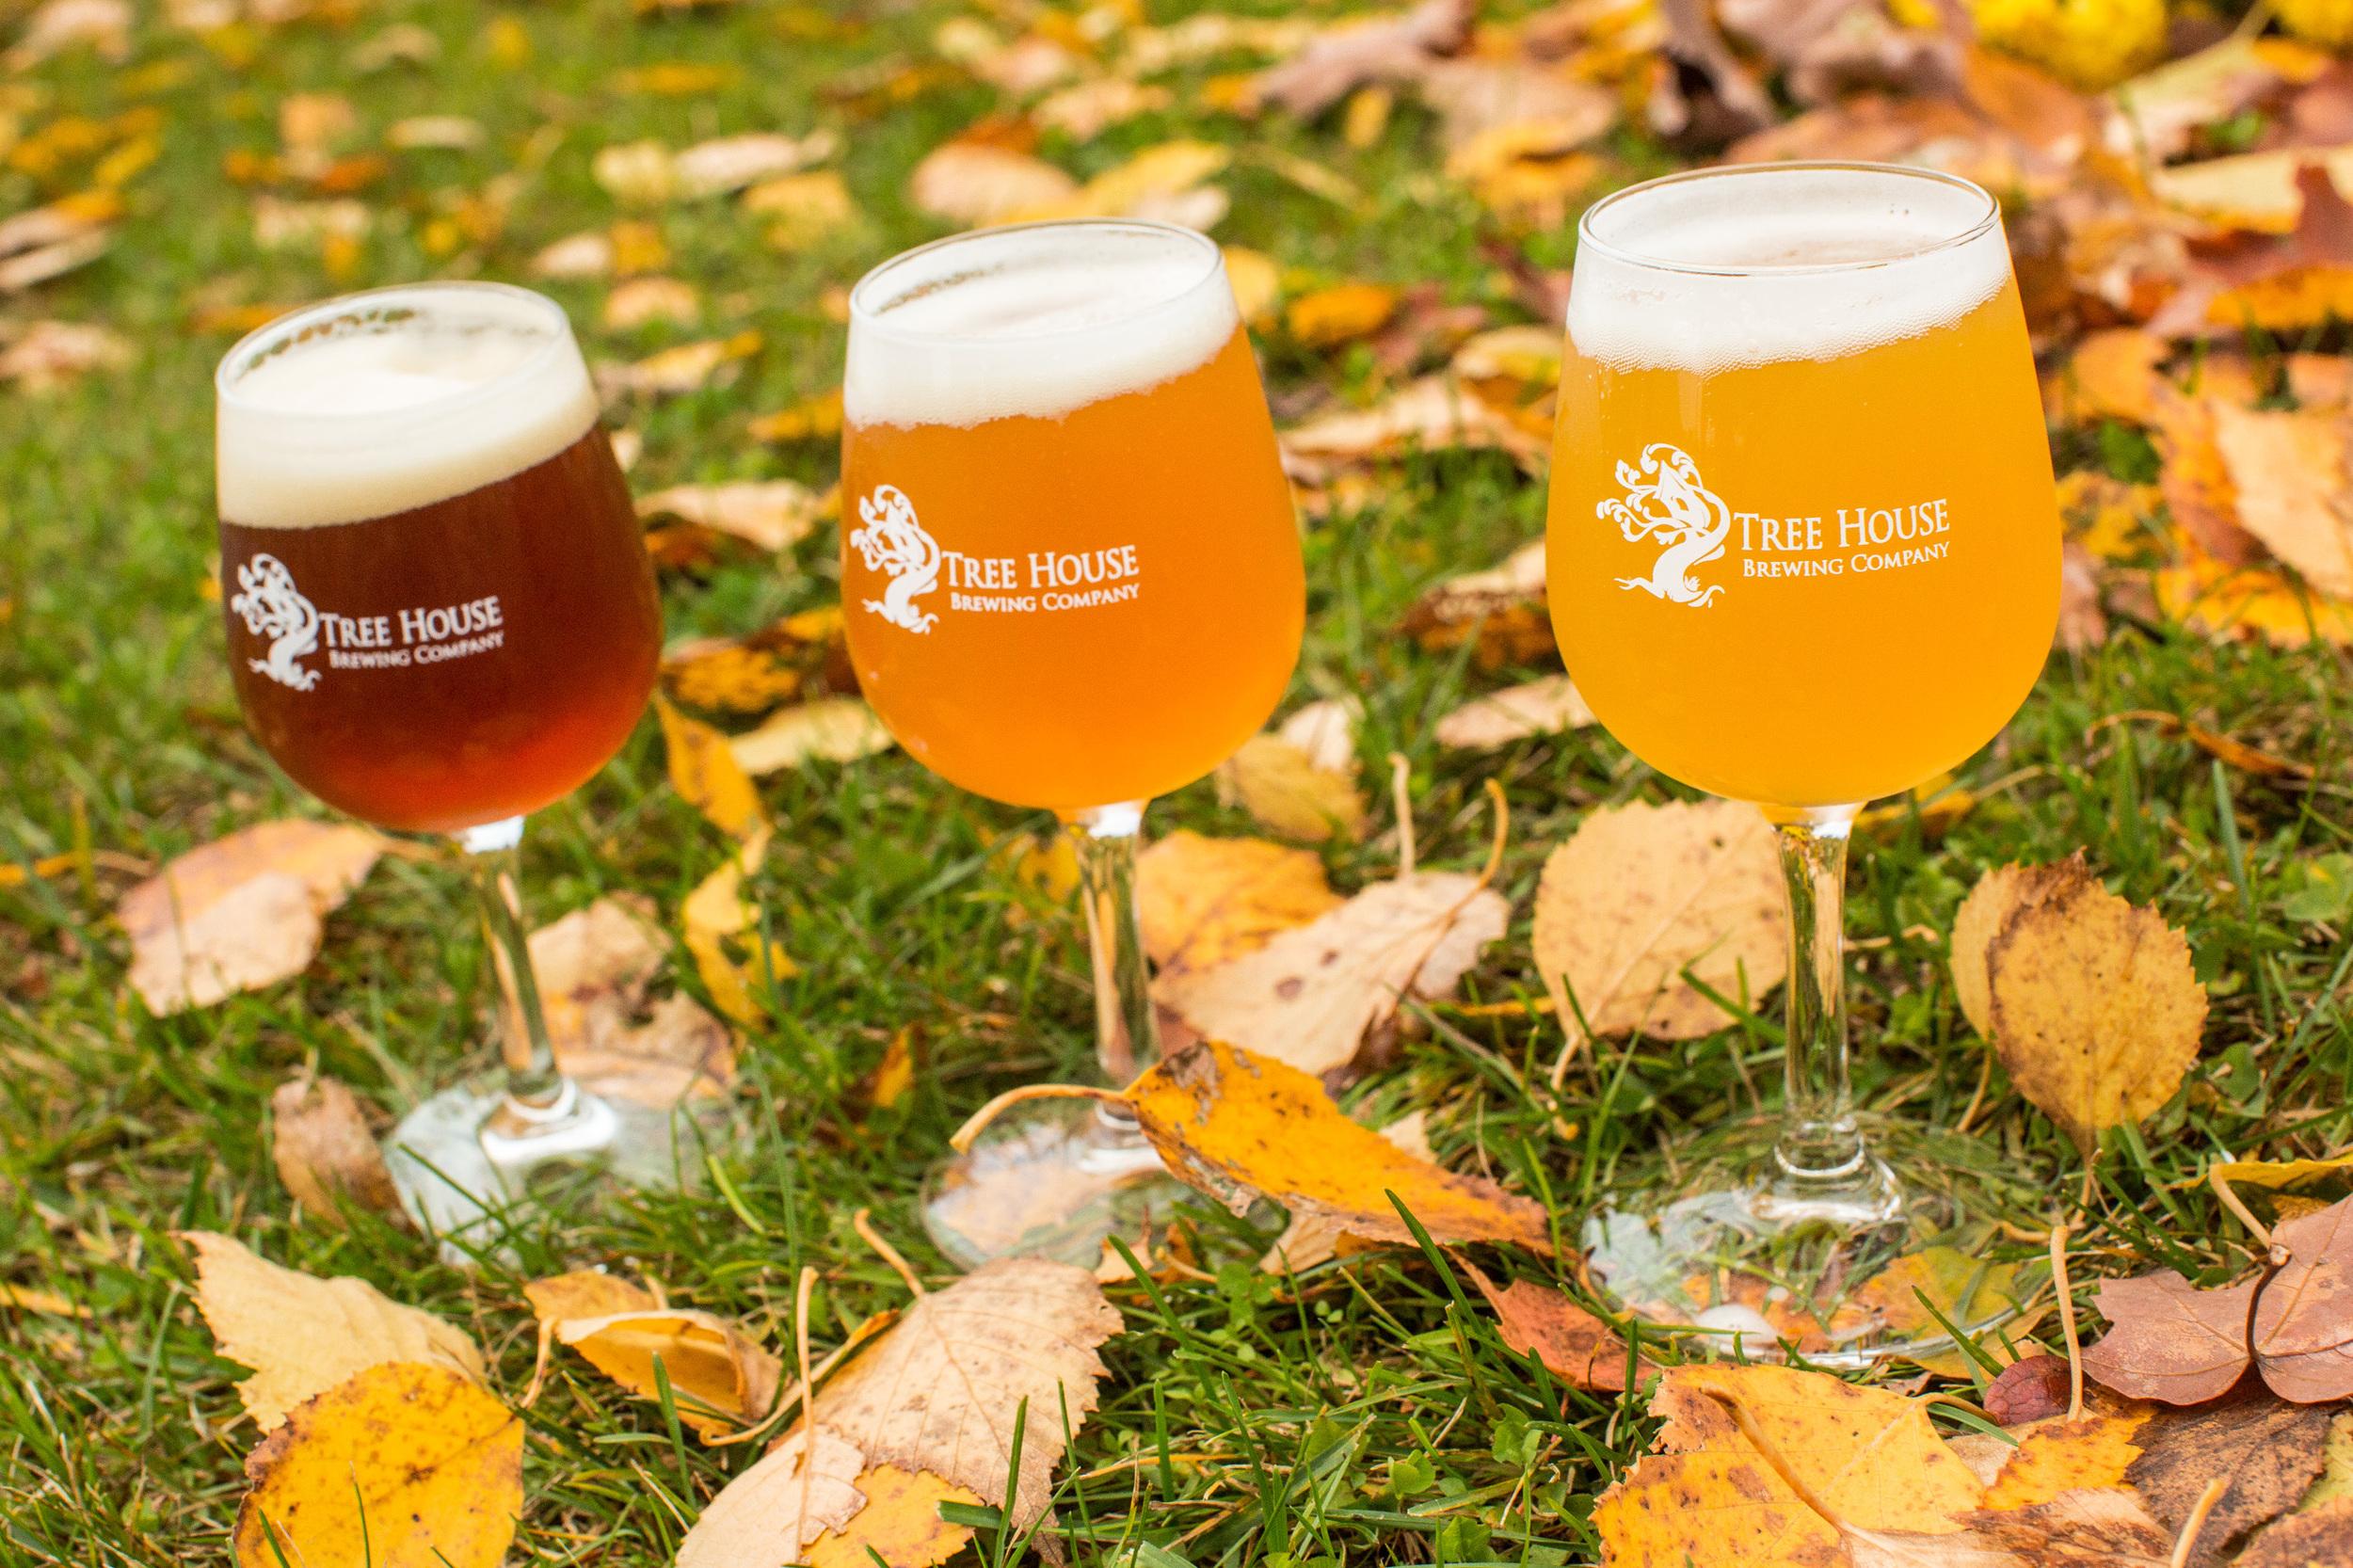 treehouse masters brewery. Treehouse Masters Brewery